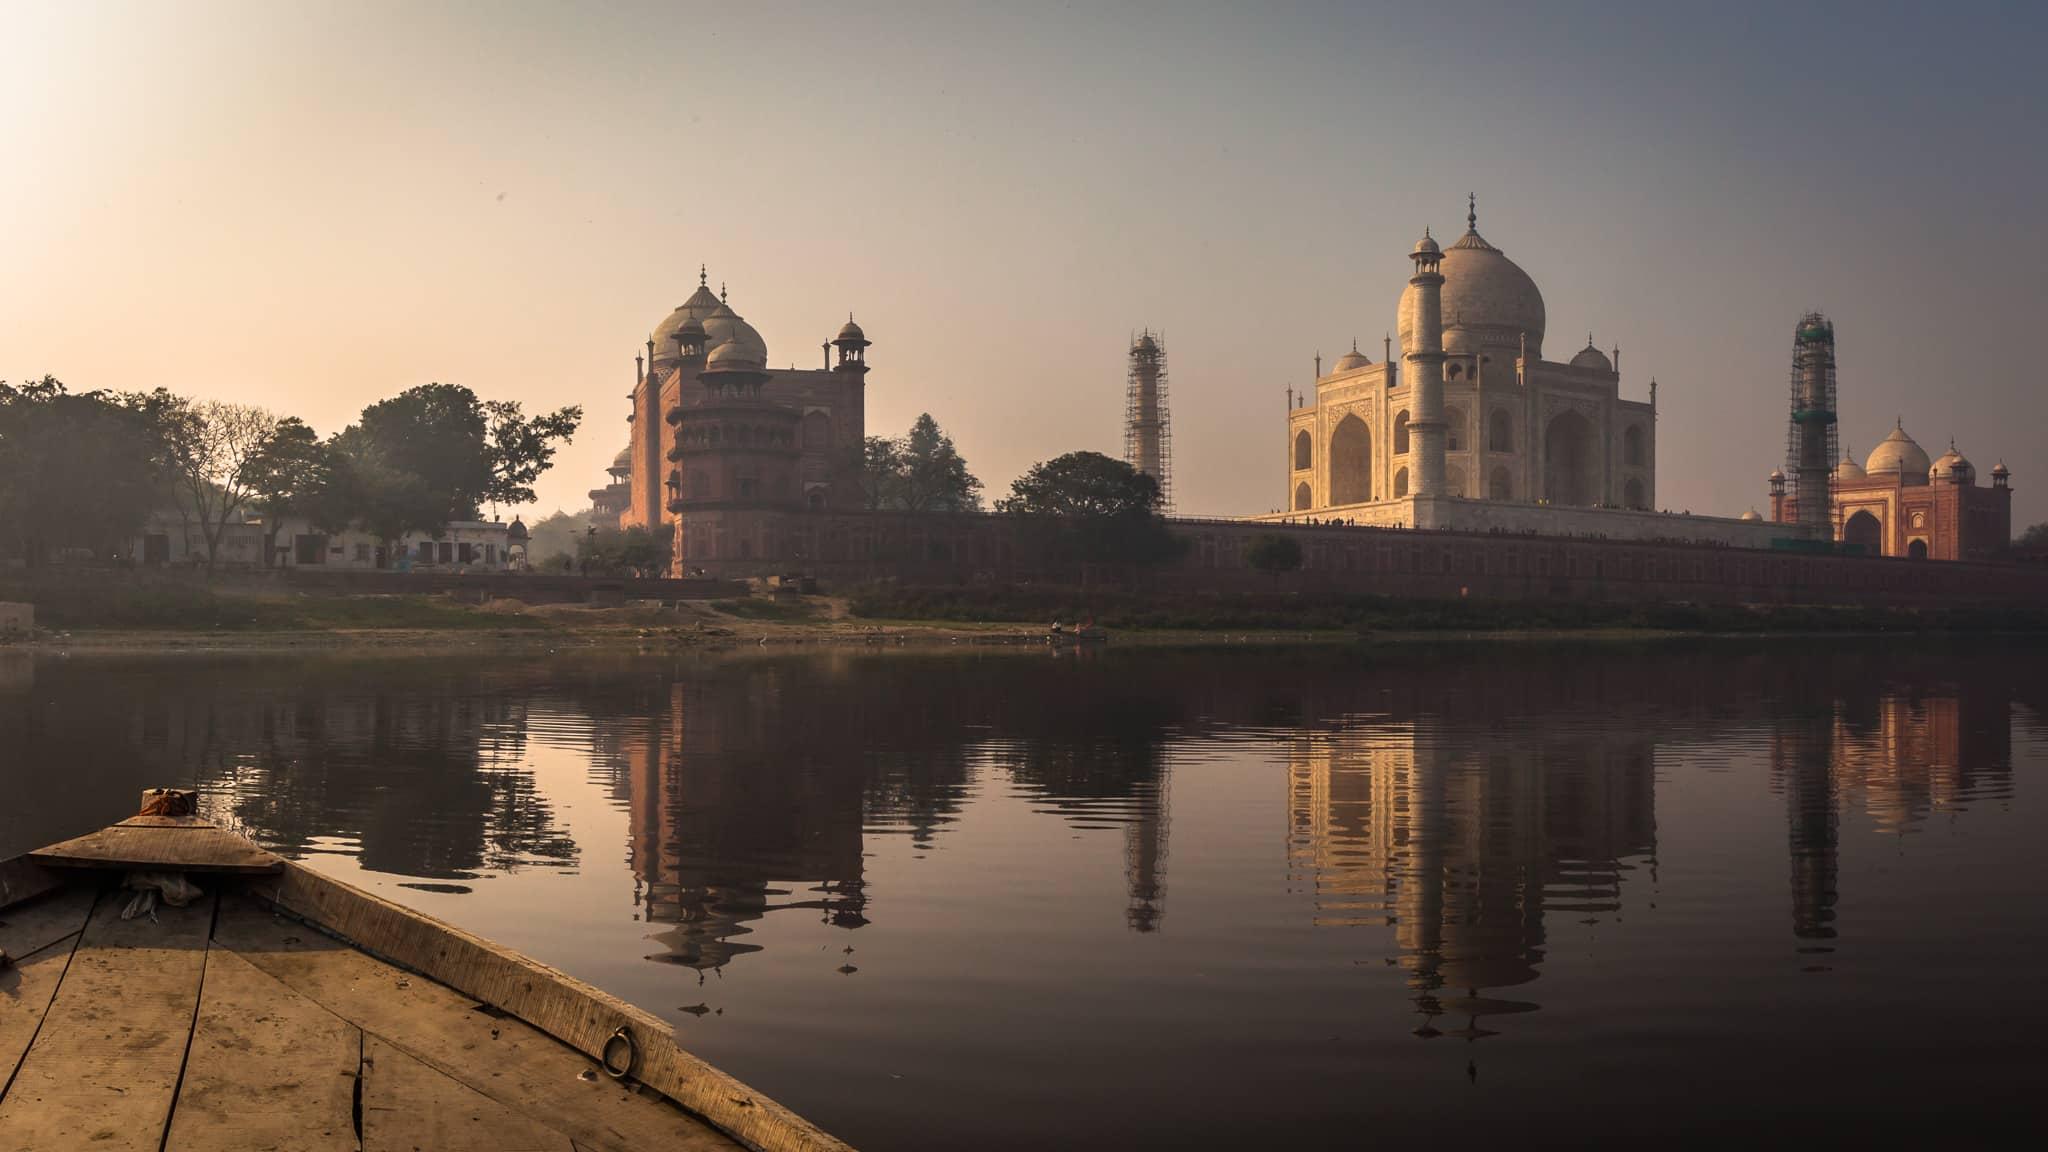 Tah Mahal Photography Tips